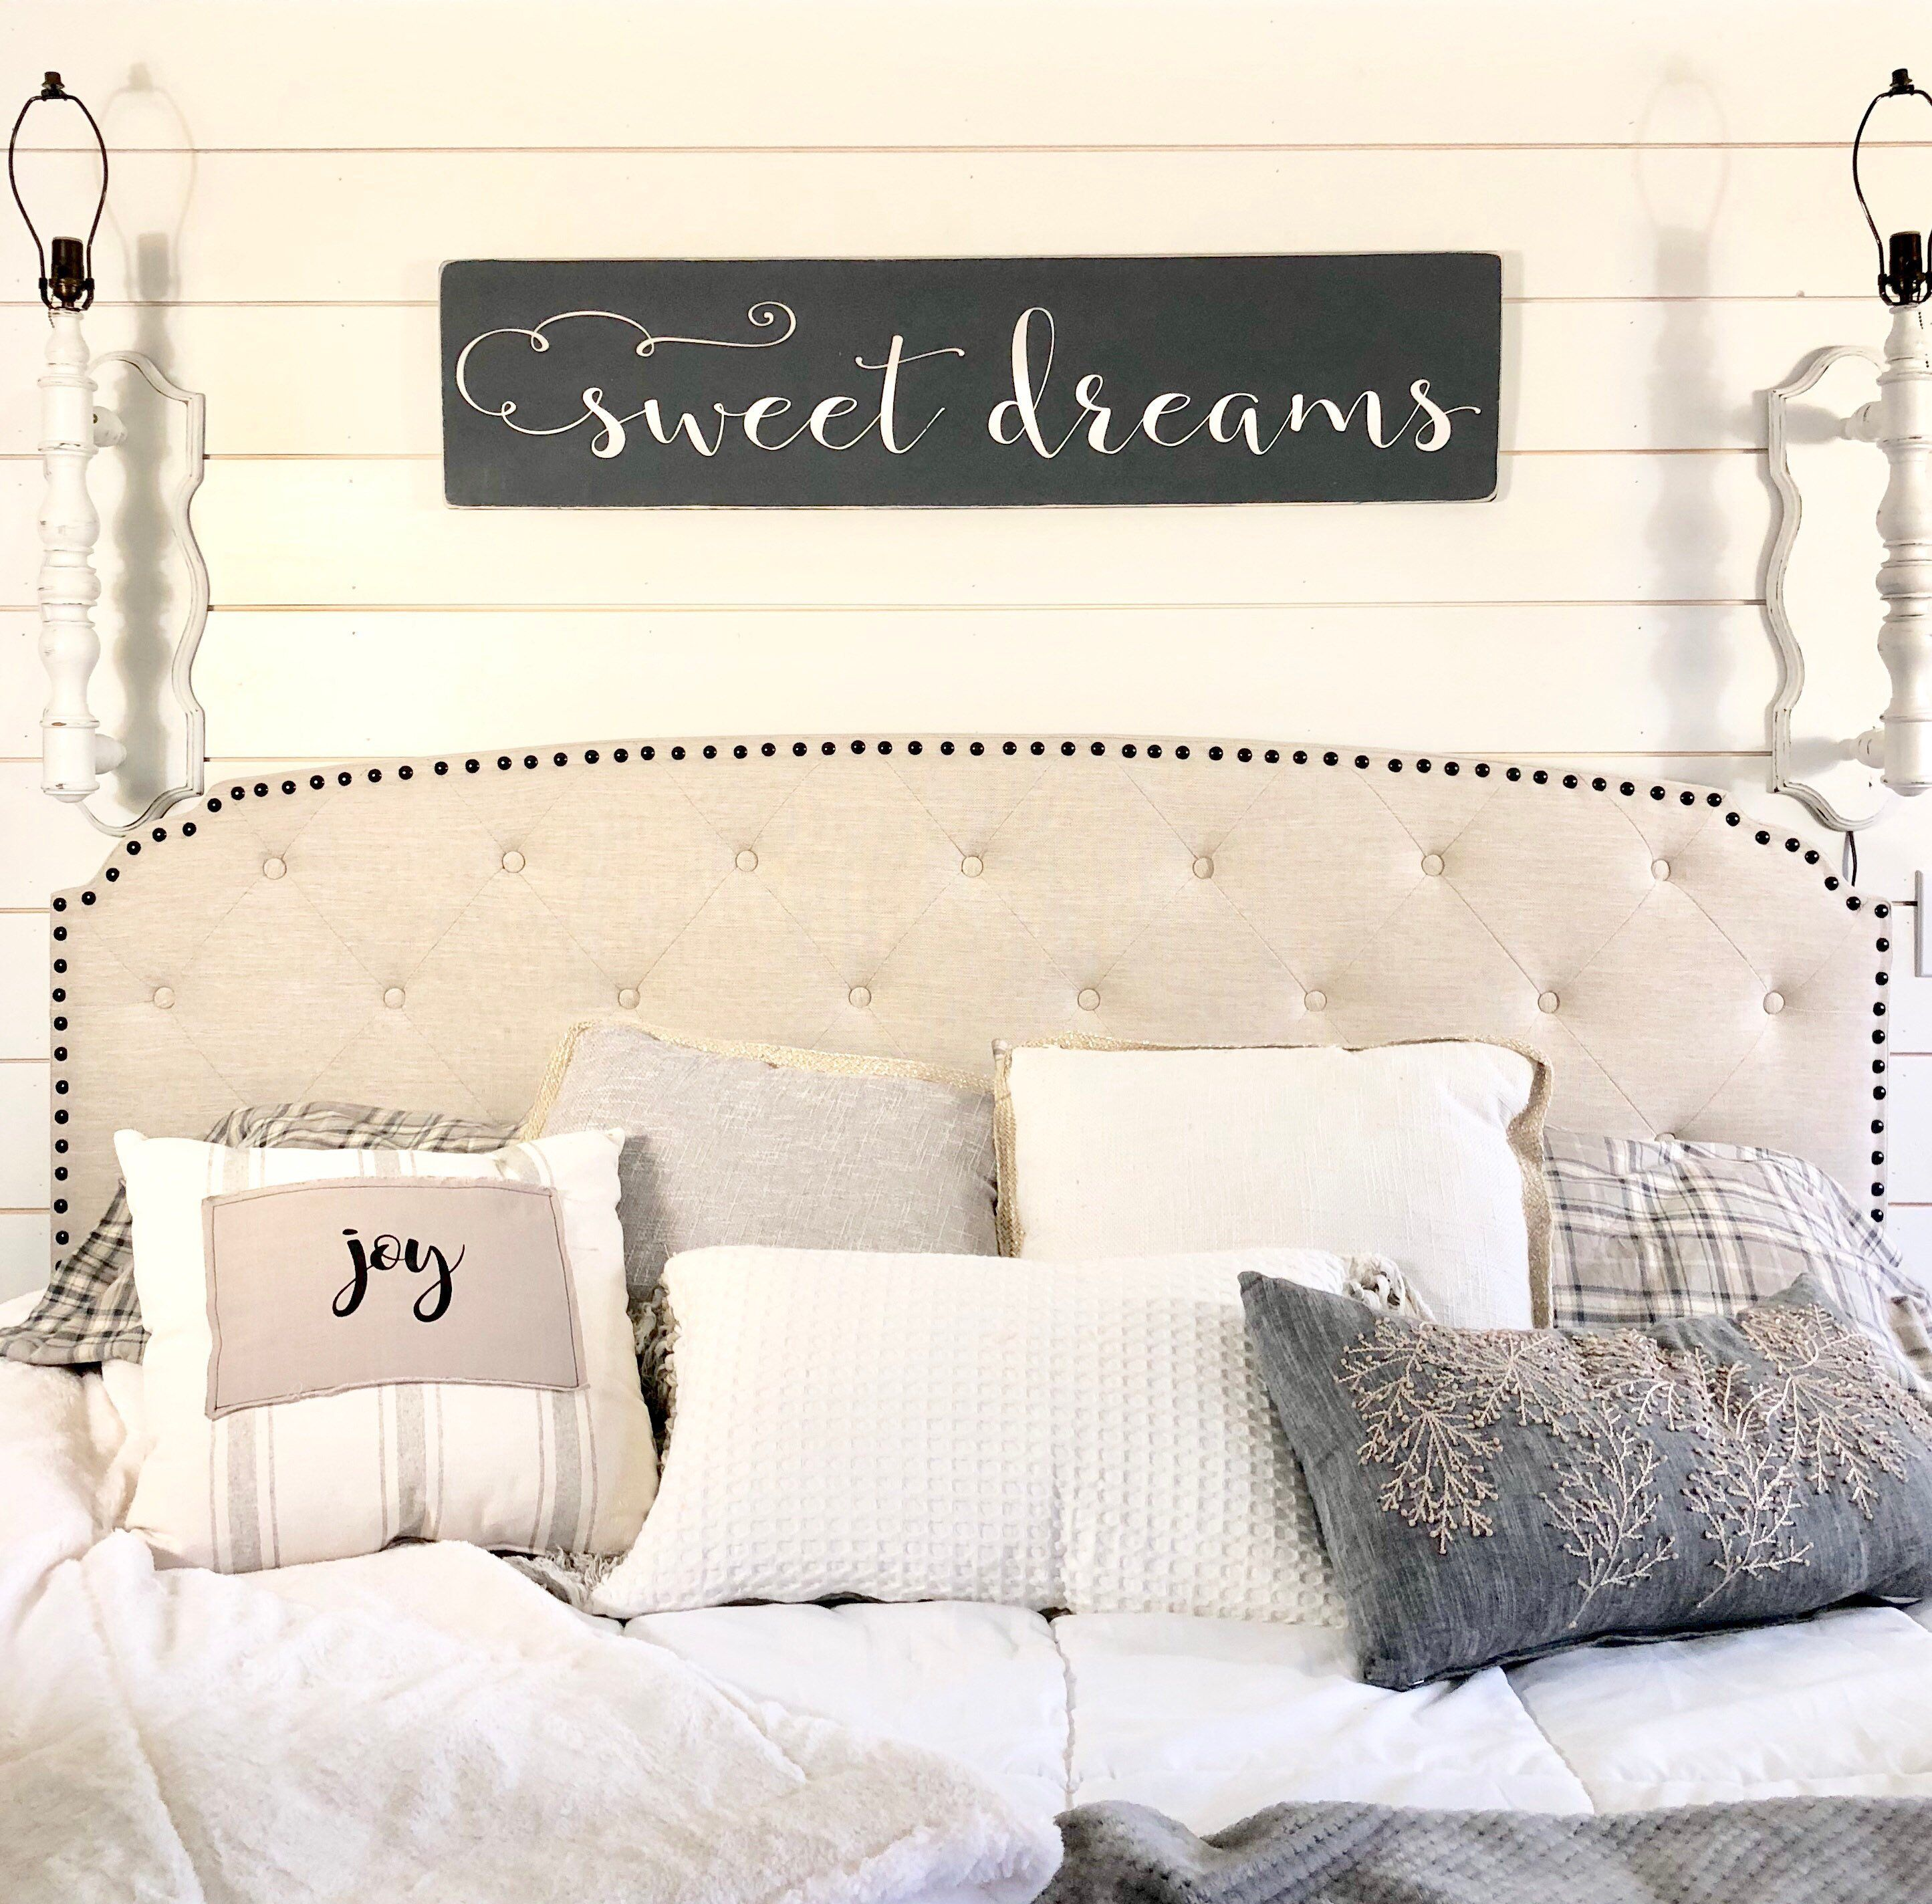 Sweet Dreams Sign Bedroom Wall Decor Rustic Wood Sign Etsy Wall Decor Bedroom Rustic Wood Signs Bedroom Wall